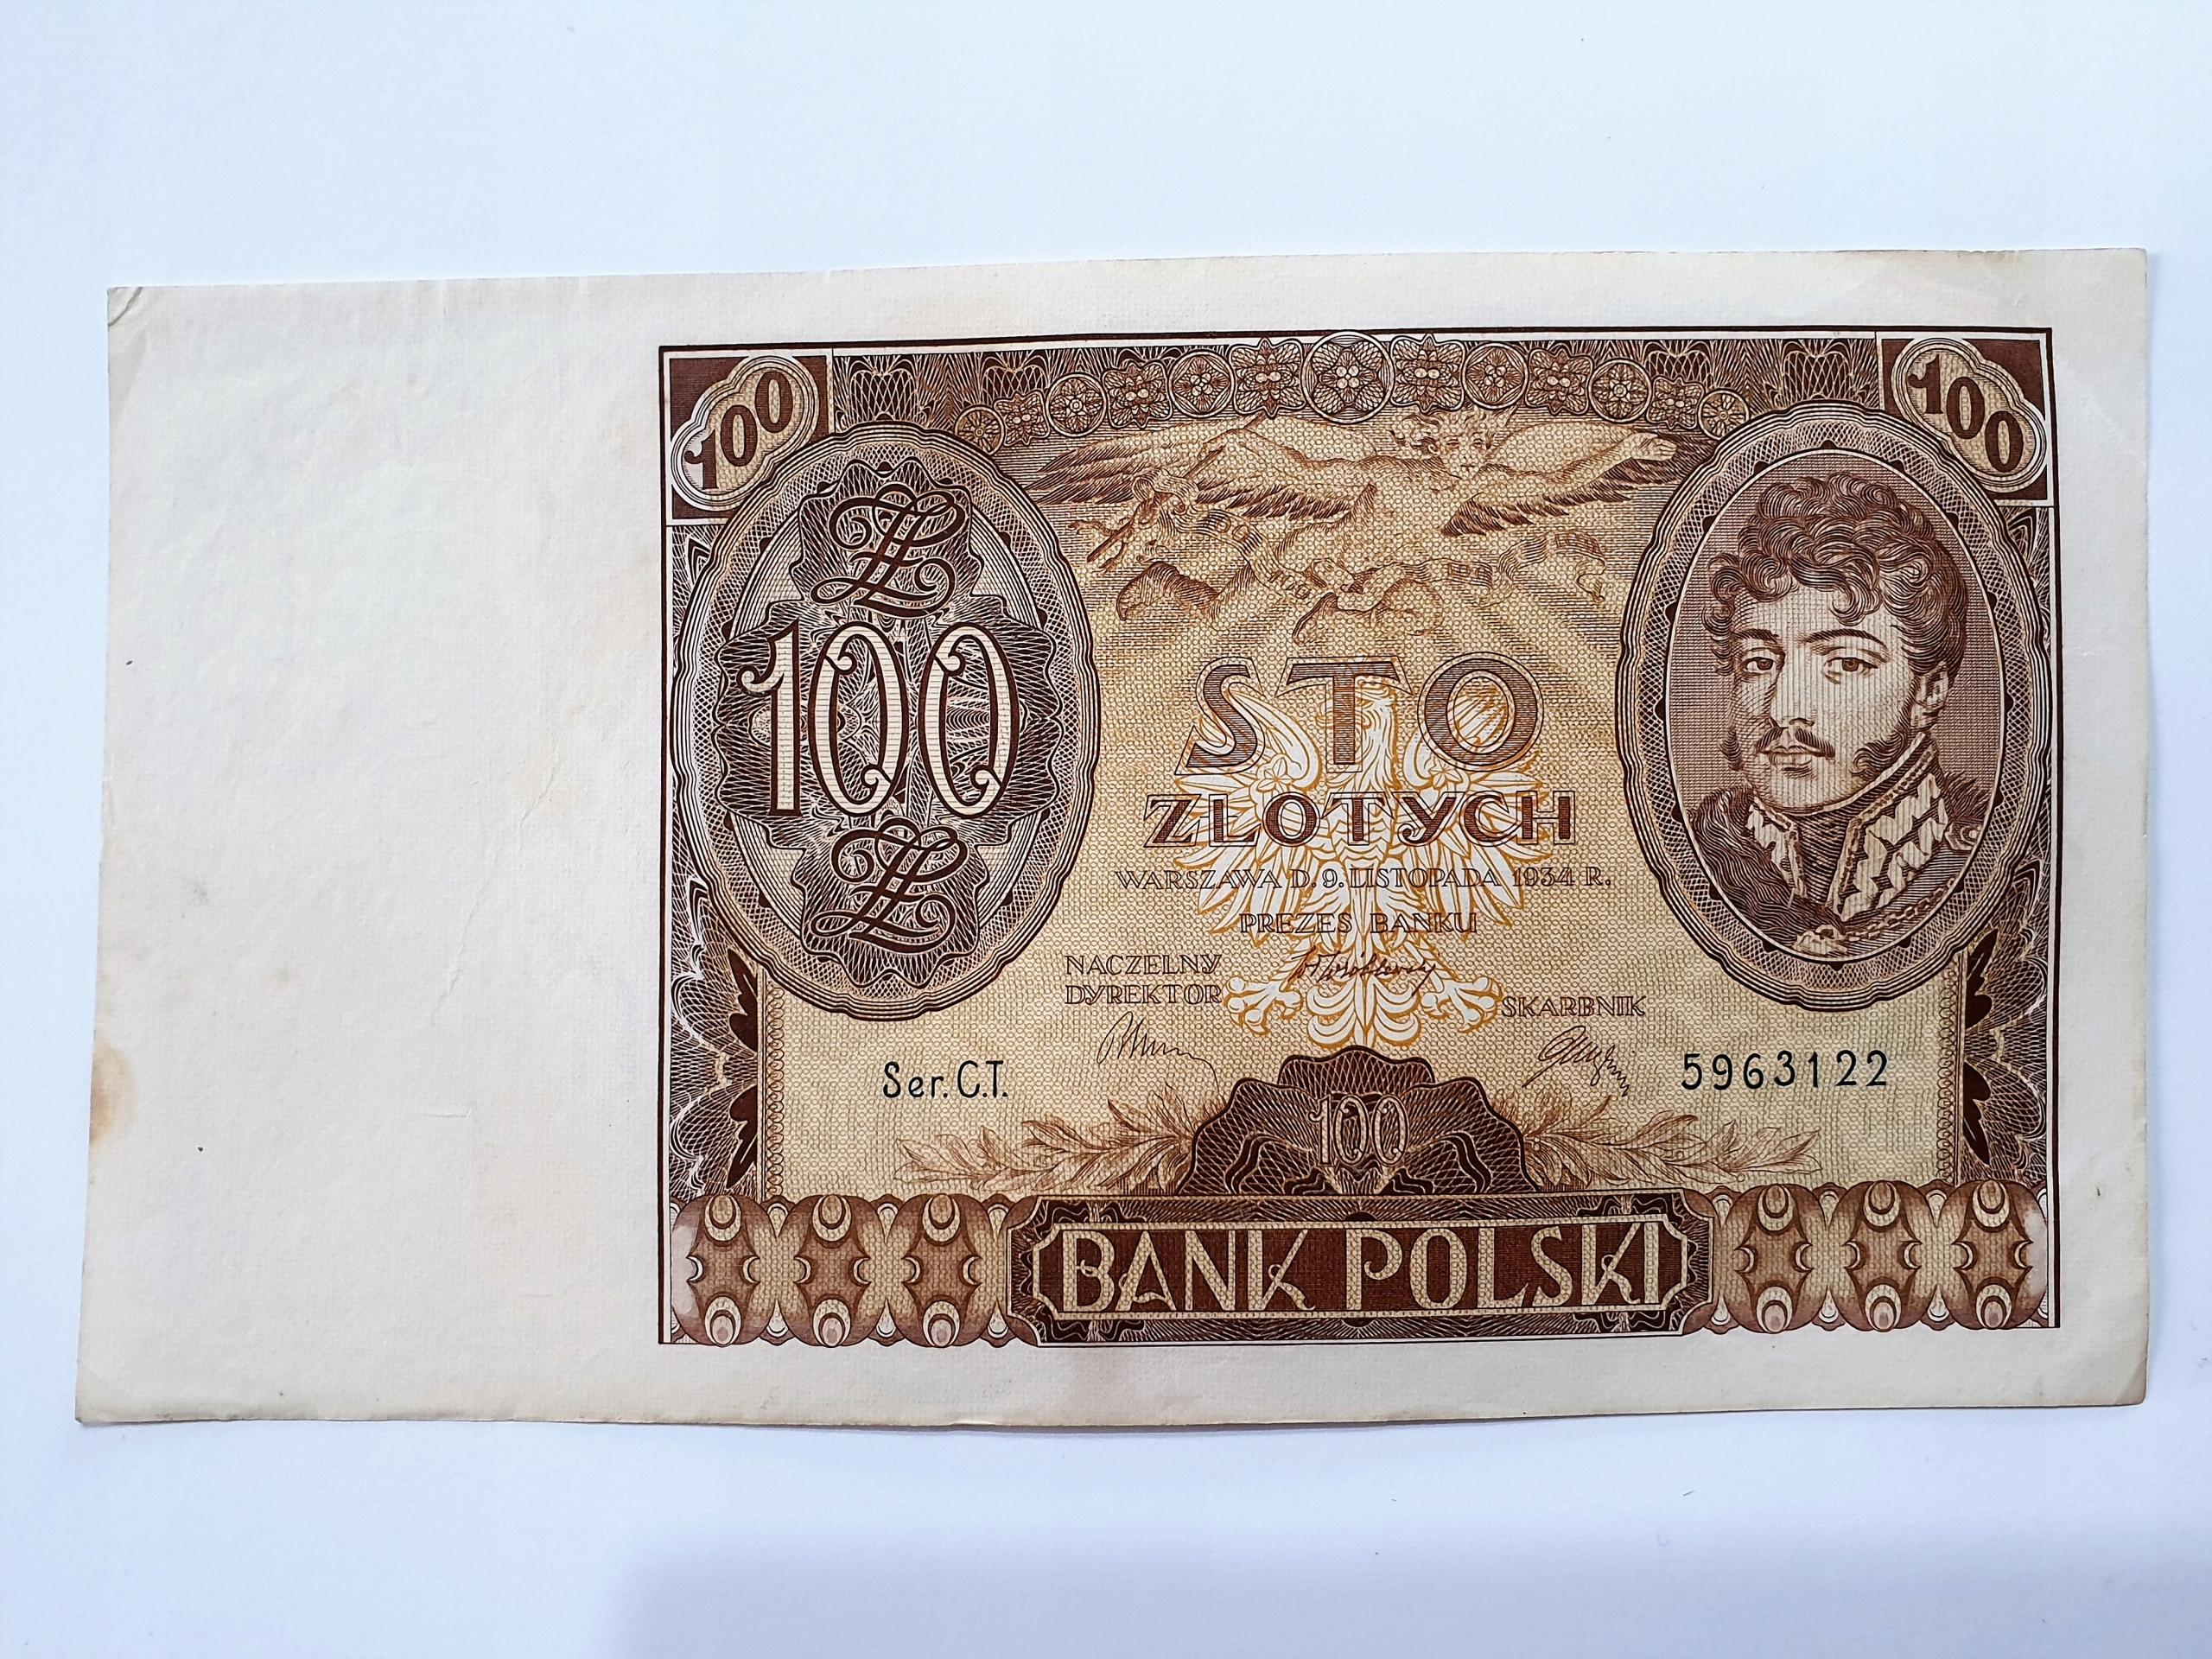 ŁADNY BANKNOT 100 ZŁ 1934 NO2